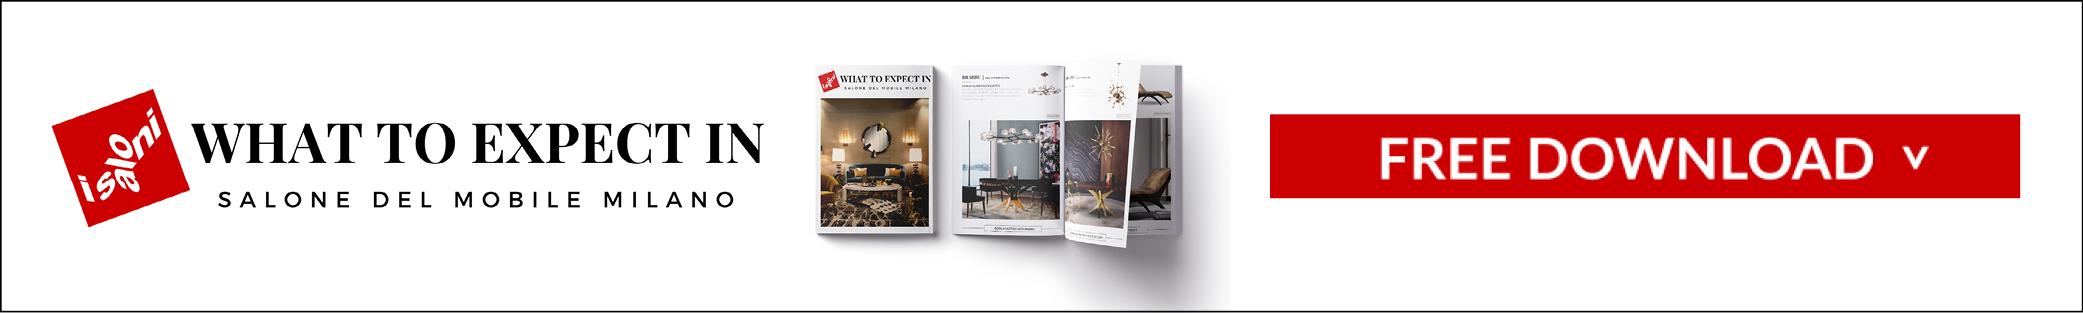 cabinet design Extravagant Maurizio Galante Cabinet Design banner  isaloni